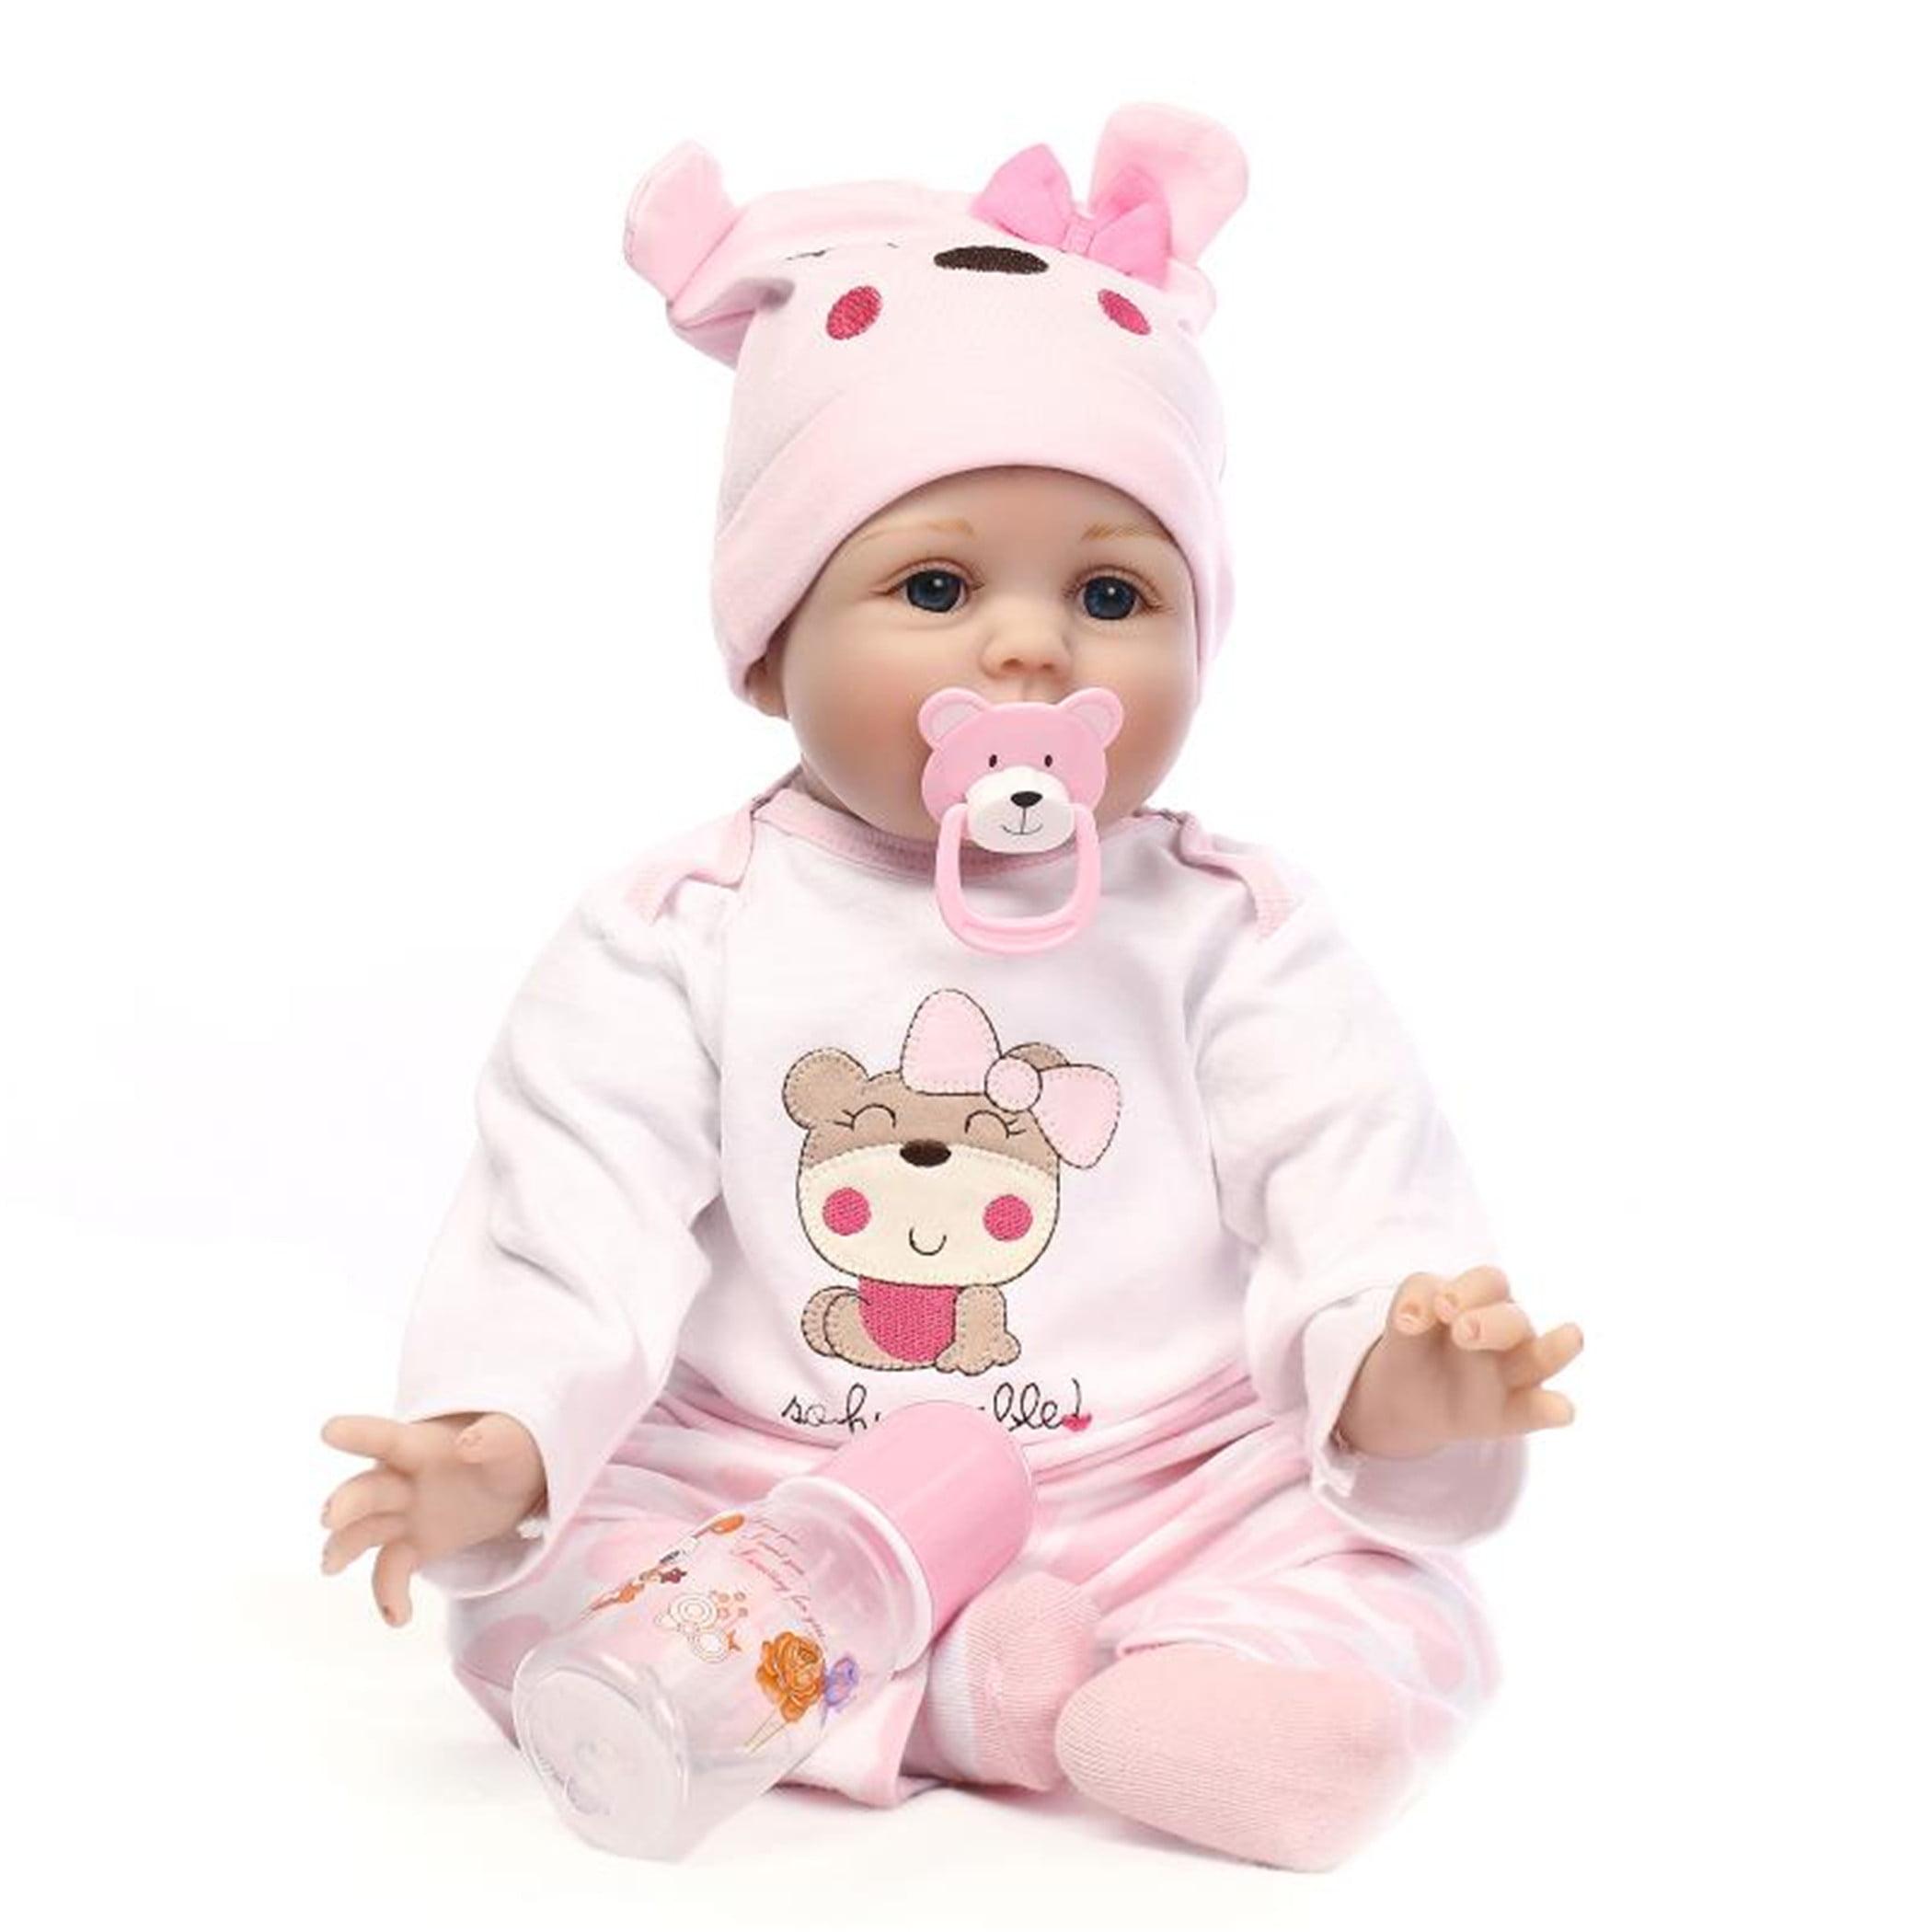 Reborn Baby Doll Soft Silicone vinyl 22inch 55cm Lovely Lifelike Cute Baby Birthday gift Christmas gift by JOVIVI